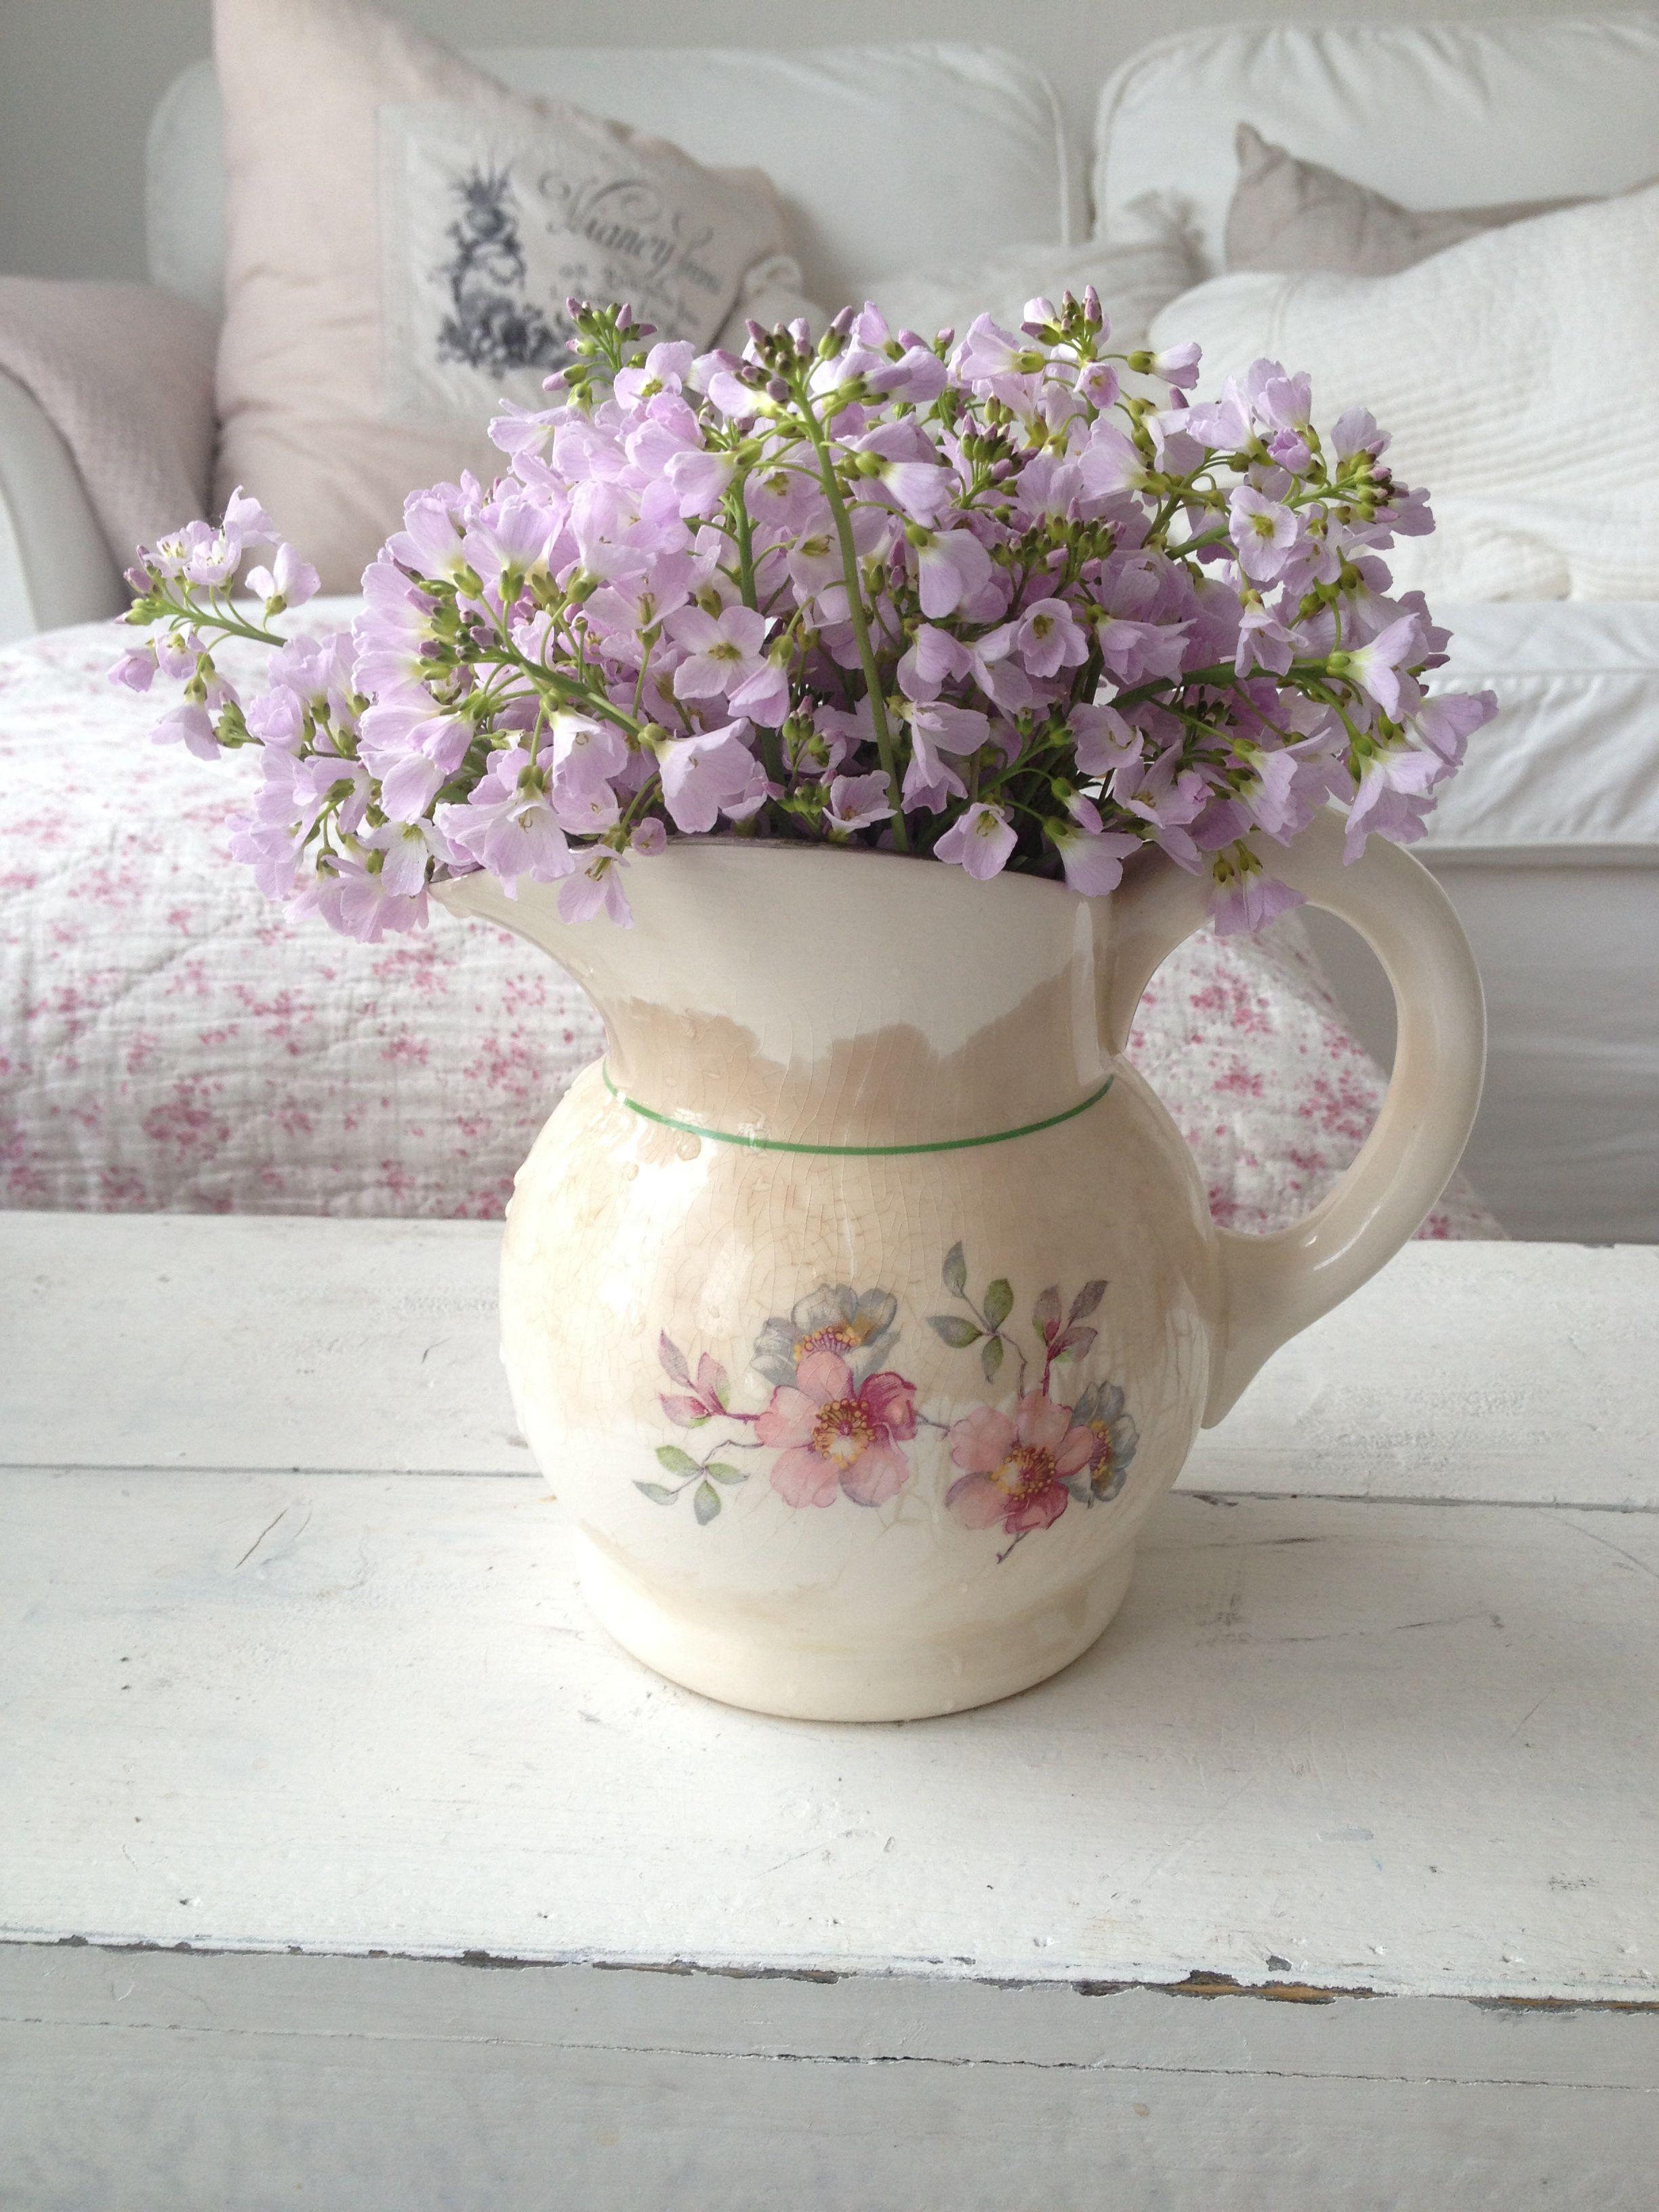 Shabby chic style Flower arrangements, Shabby chic style